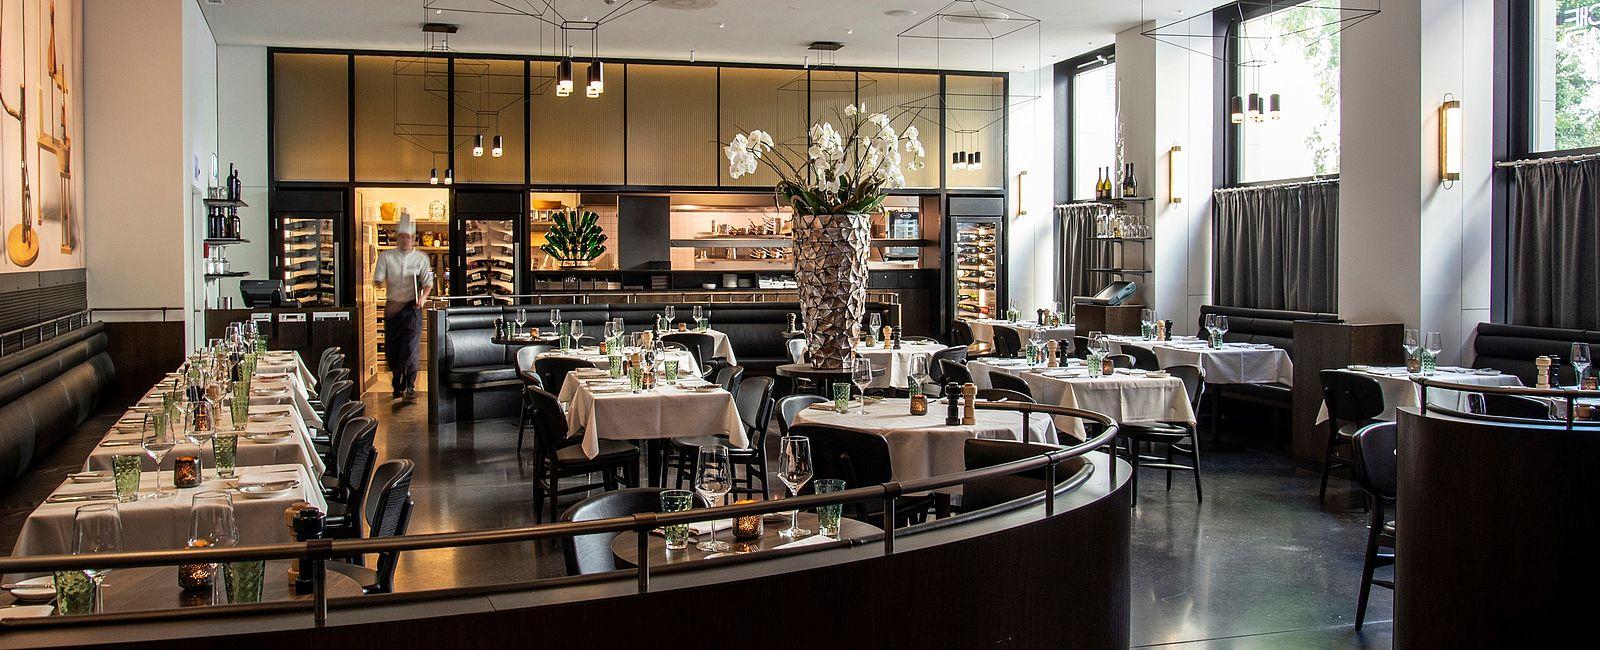 Baltho Küche & Bar - Connoisseur Circle News